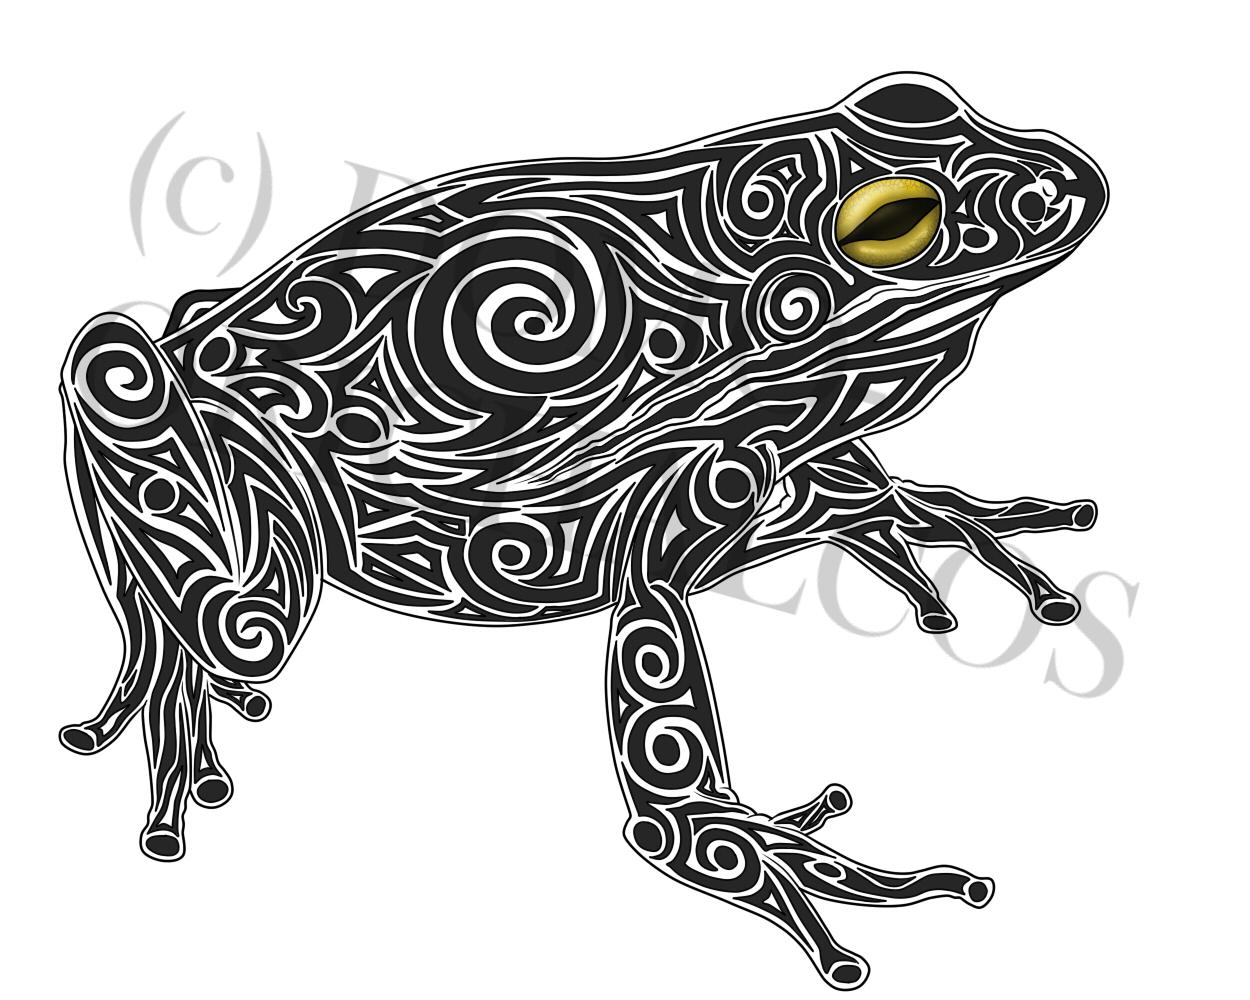 D Frog Tattoo Design